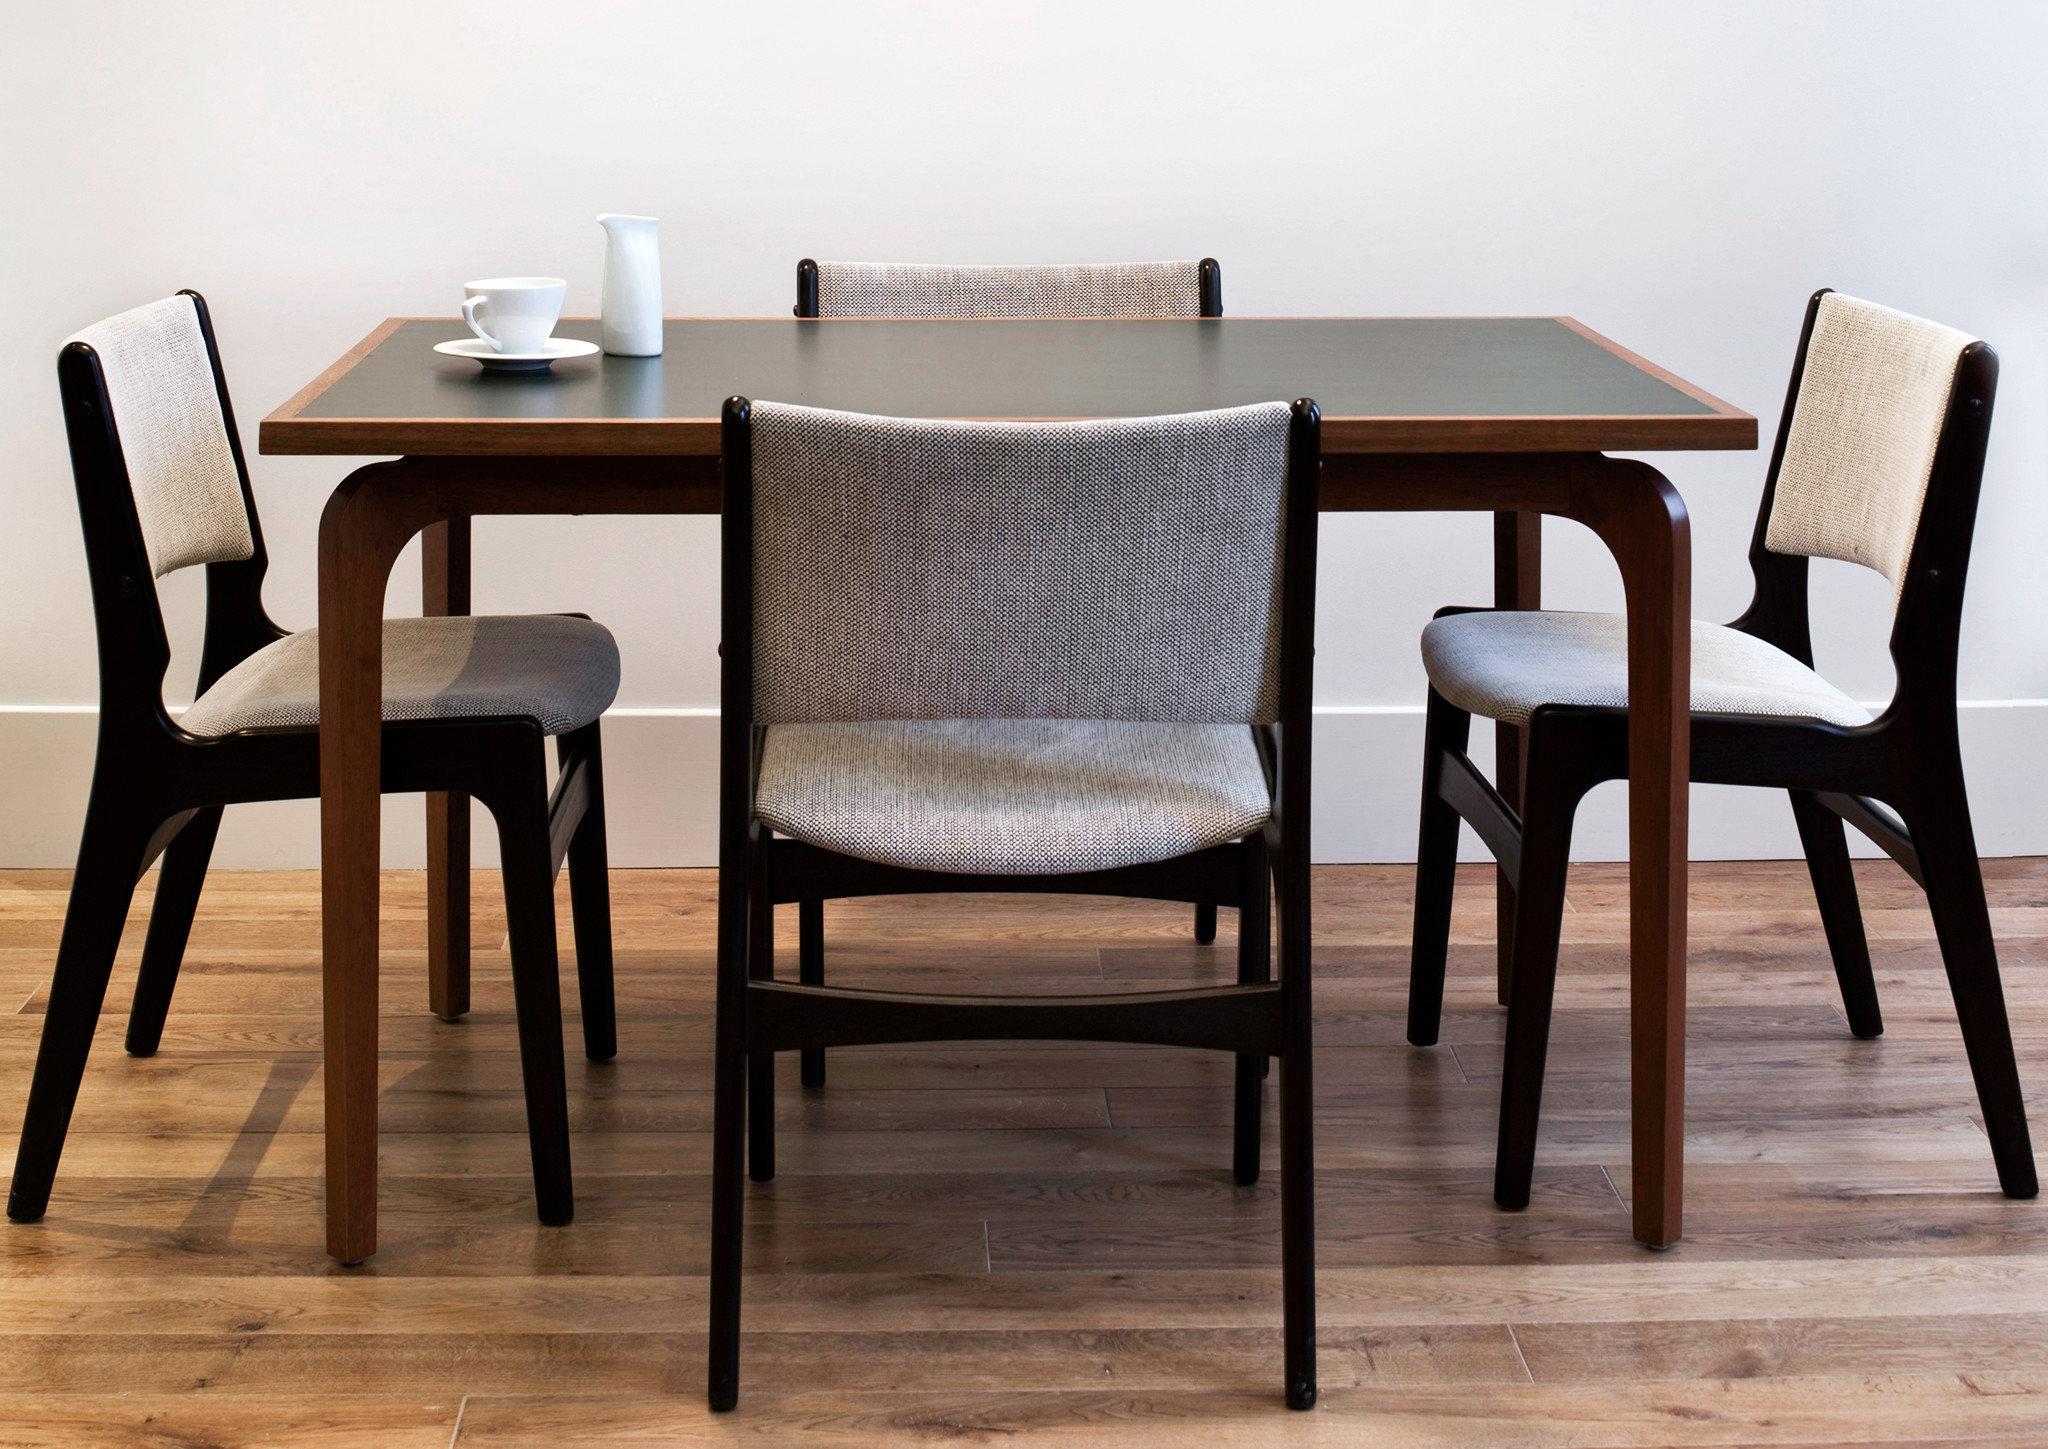 chair wooden hardwood flooring wood flooring dining table